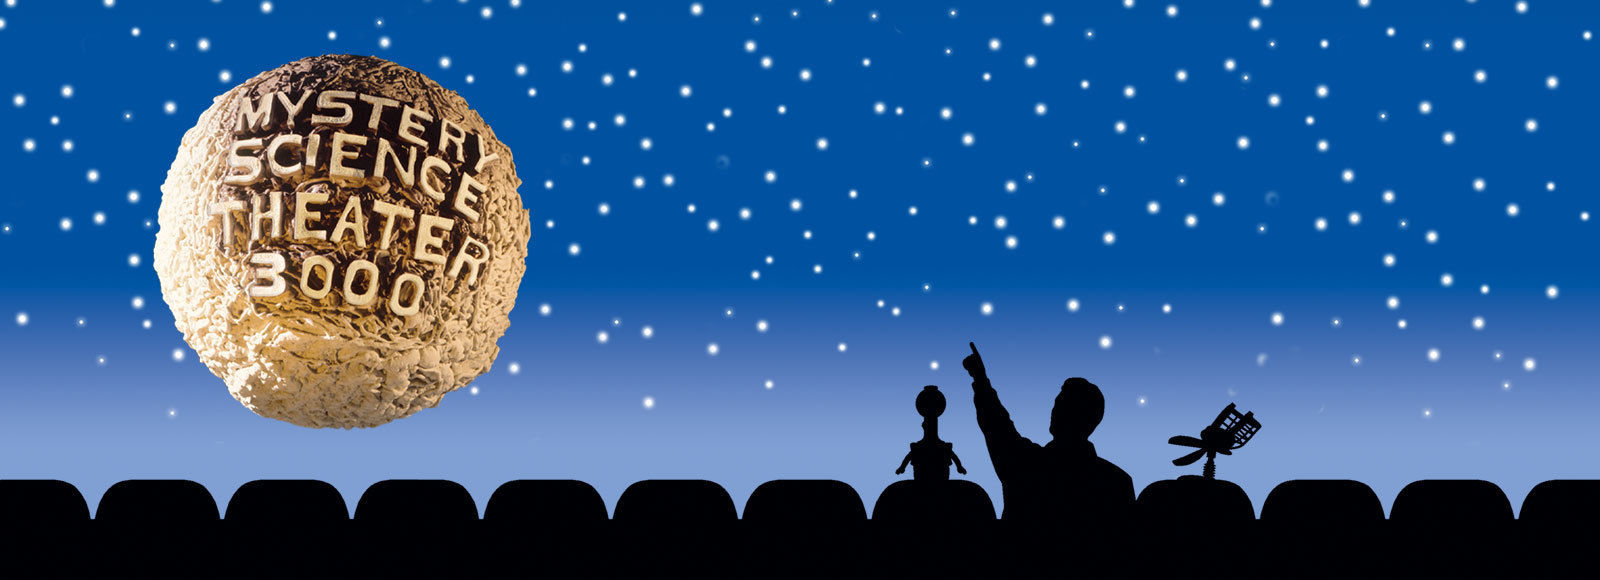 StarloggersMain menuTag Archives: Jonah HestonPost navigationThe Return of Mystery Science Theater3000!Post navigationCategoriesArchivesTop Posts & PagesFollow Blog via EmailStarloggers.comFollow on Twitter